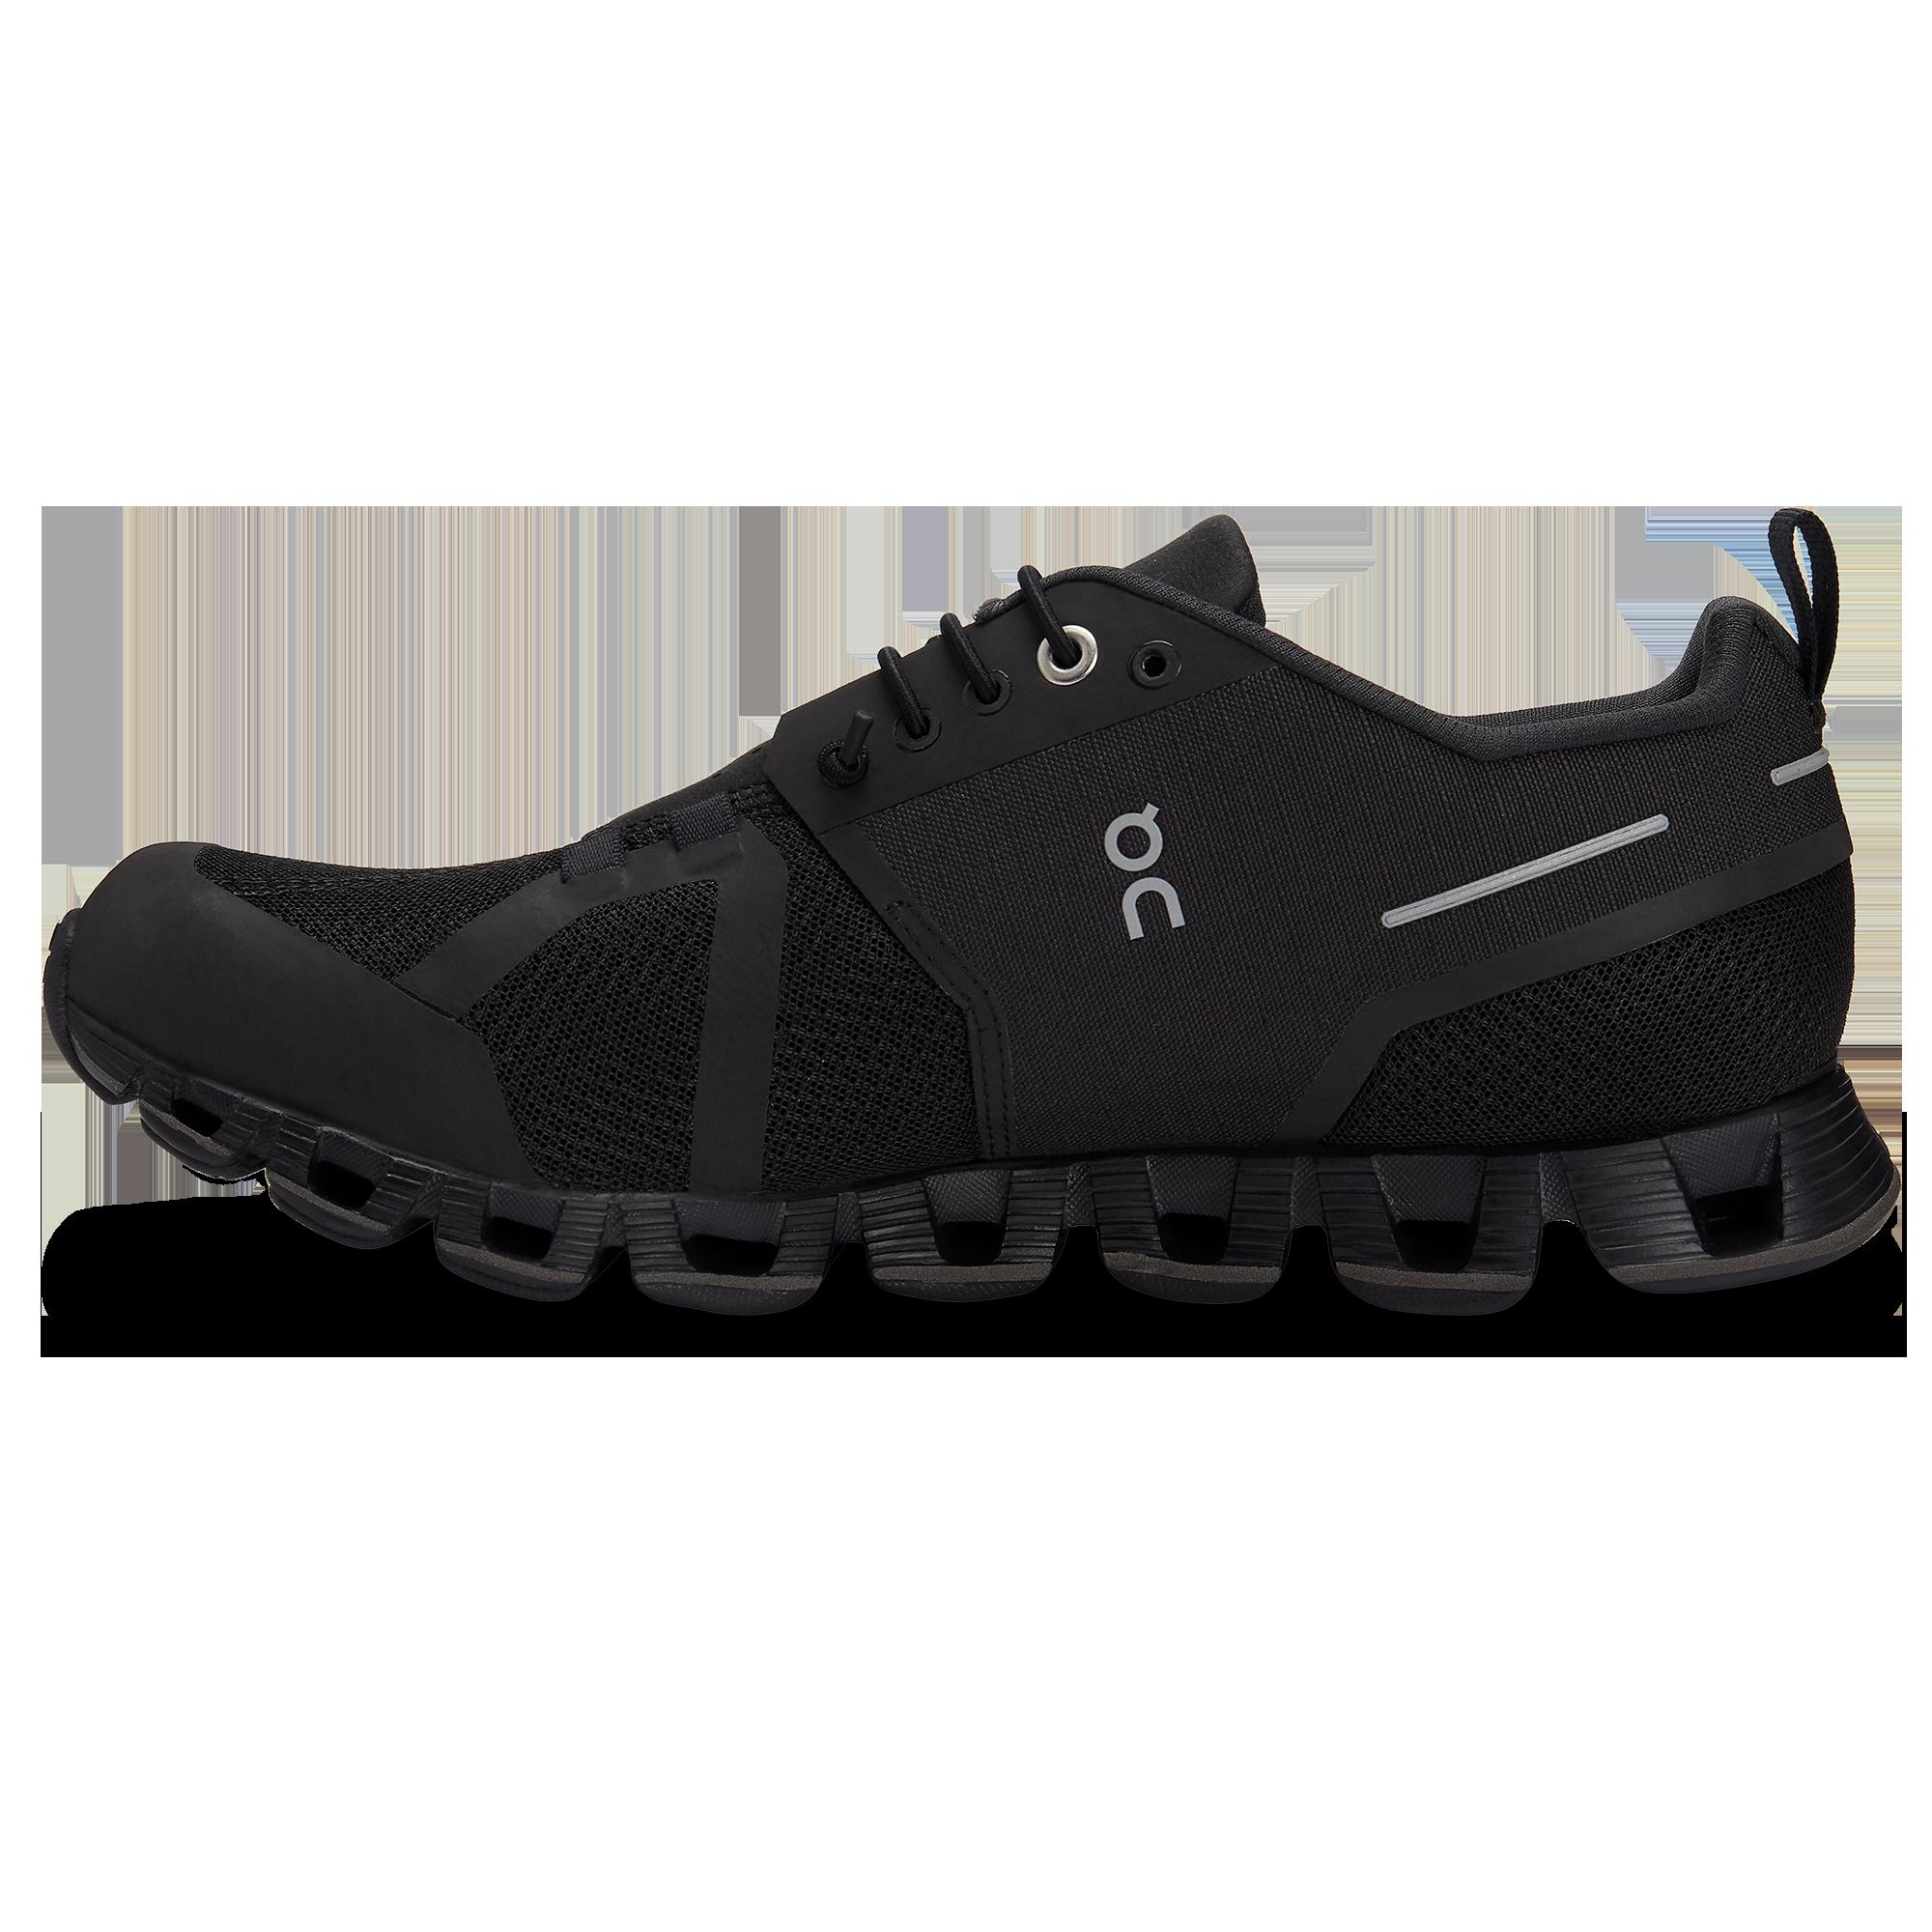 on running shoes waterproof